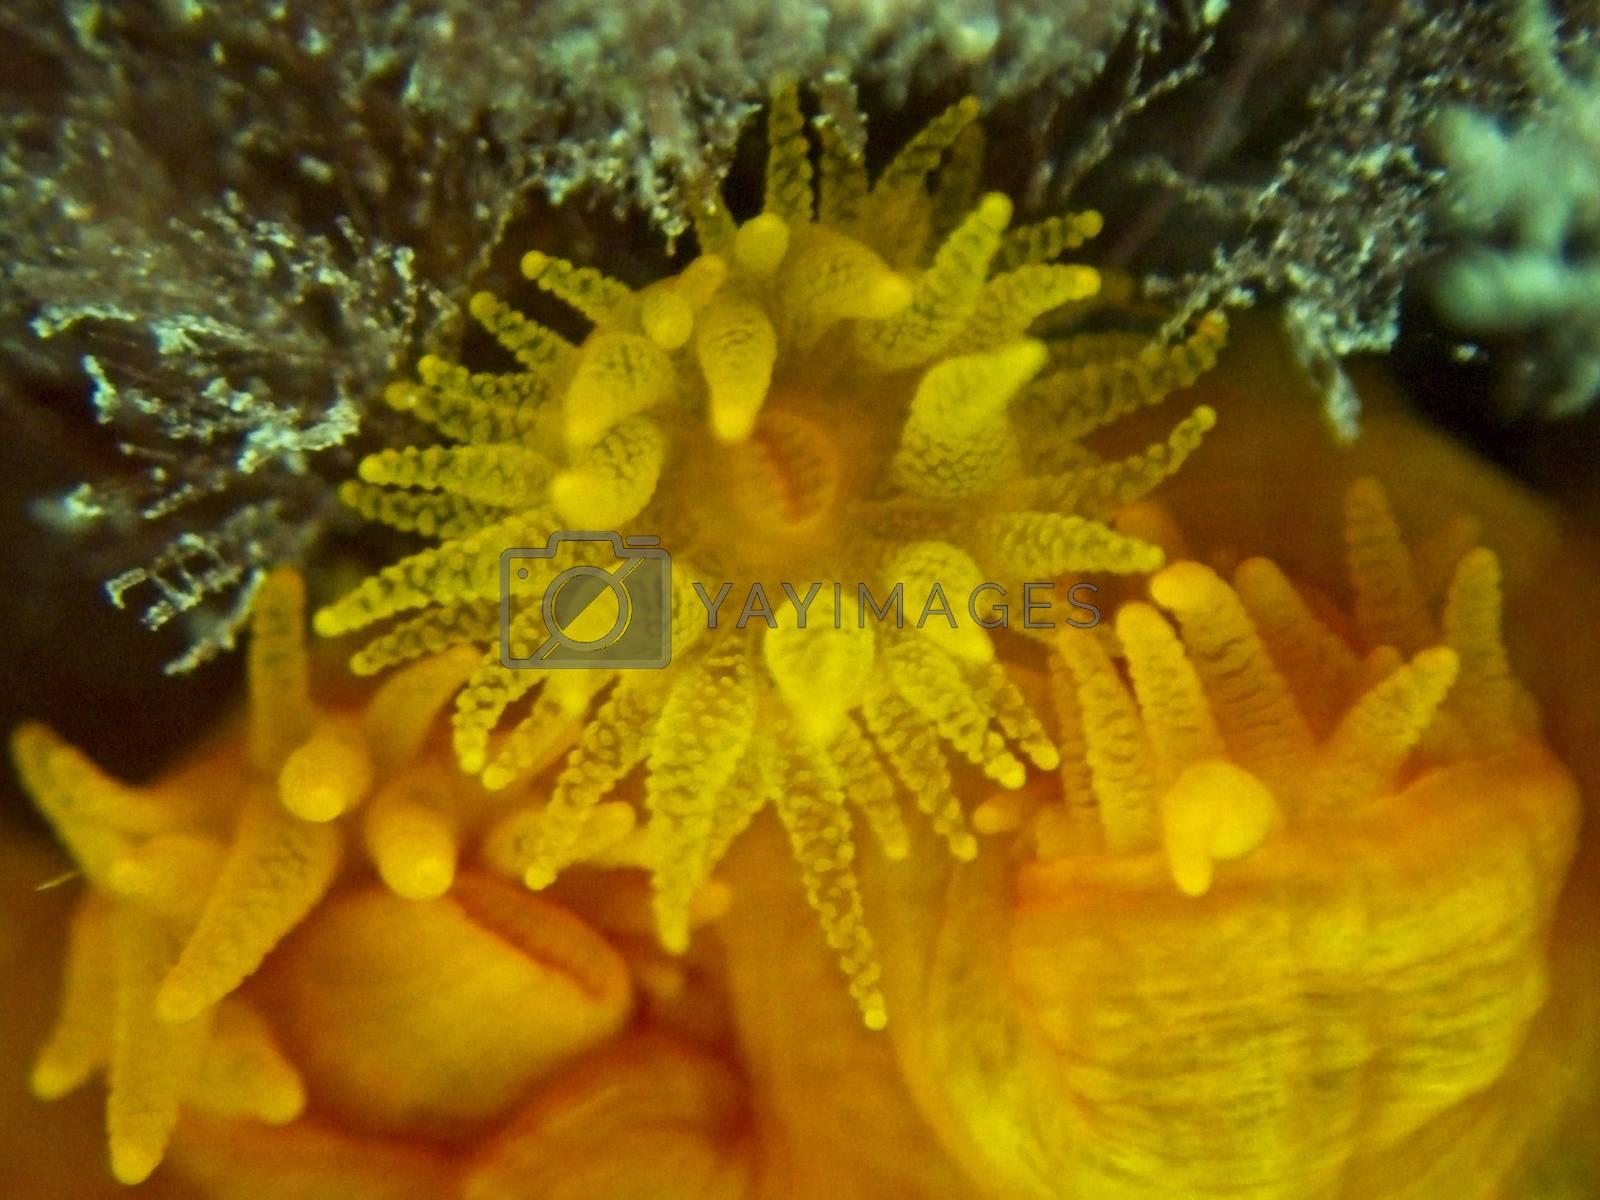 Orange Sun Coral, or Tubastrea Faulkneri, in warm Maltese waters